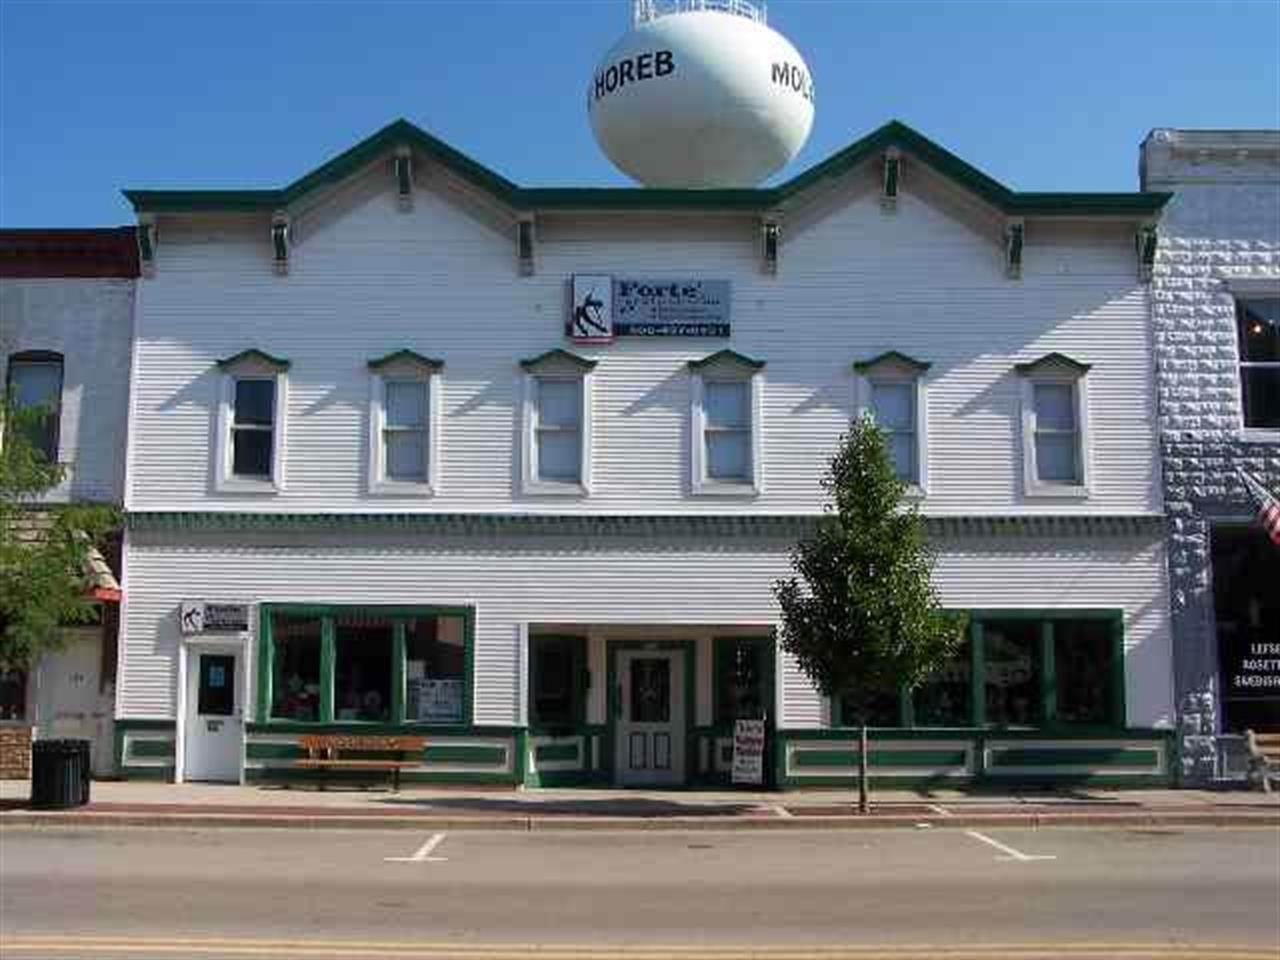 126 E Main St, Mount Horeb, WI 53572